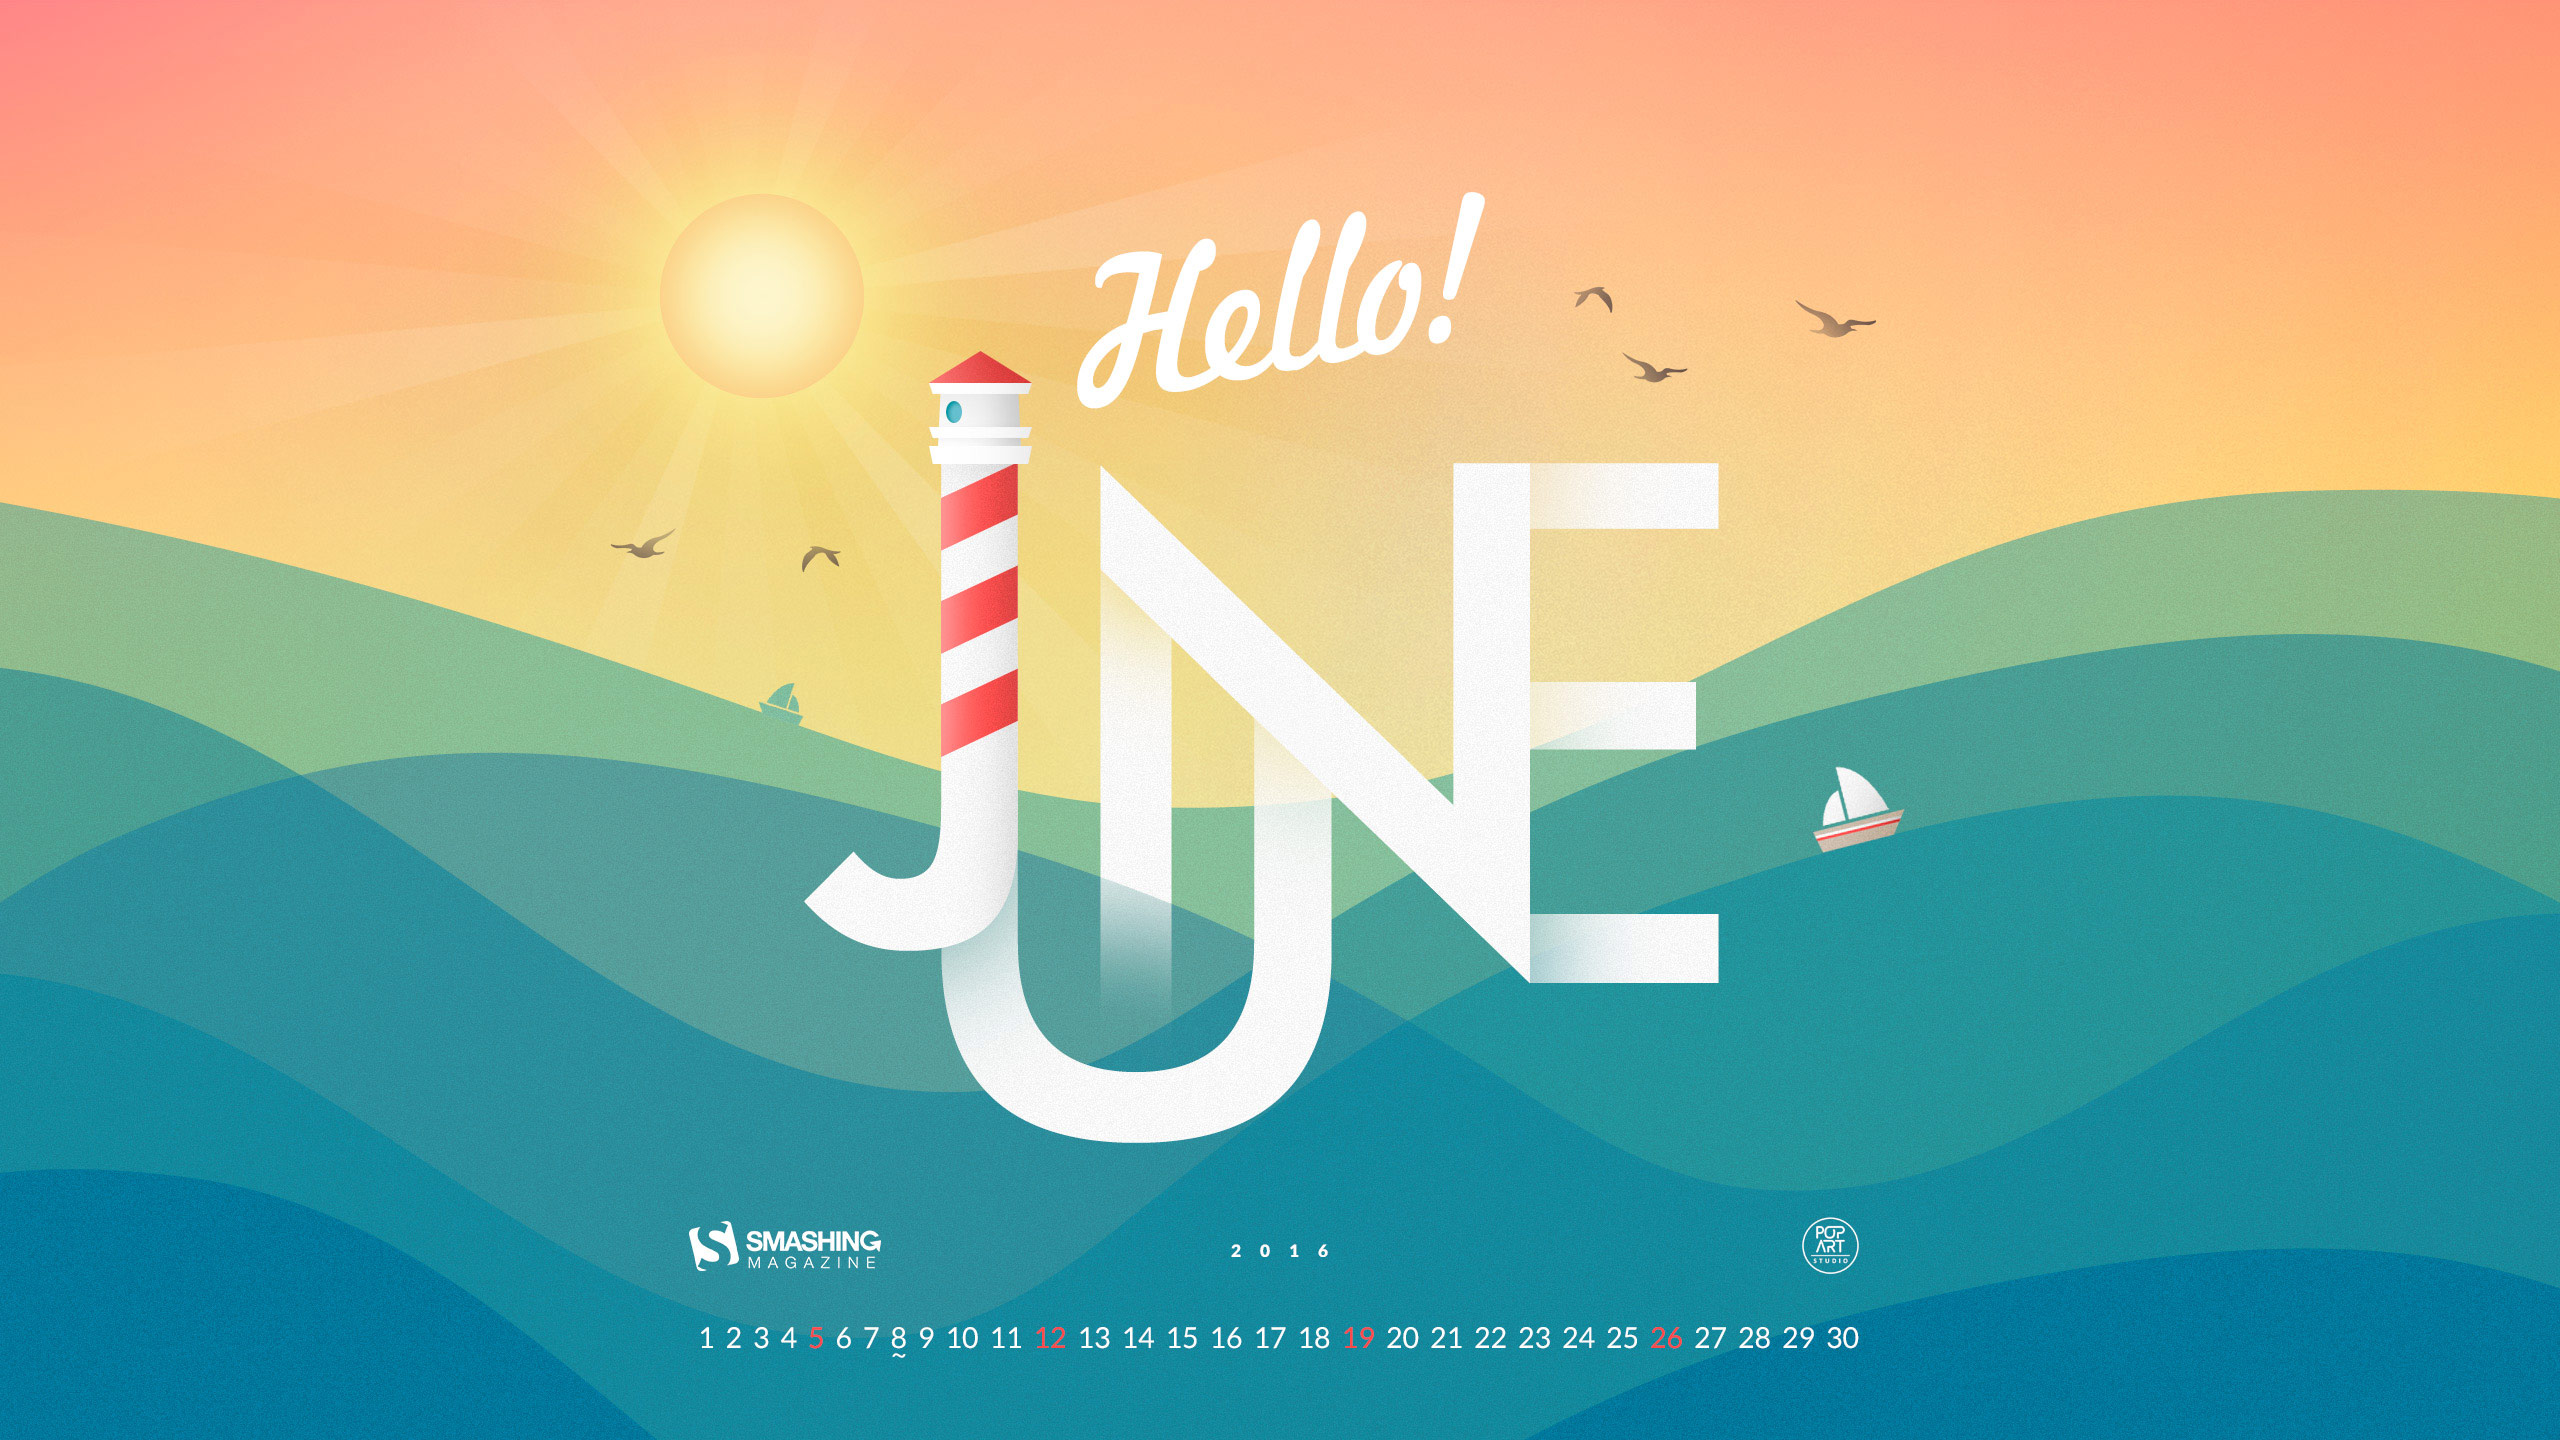 Desktop Wallpaper Calendars June 2016 Smashing Magazine 2560x1440